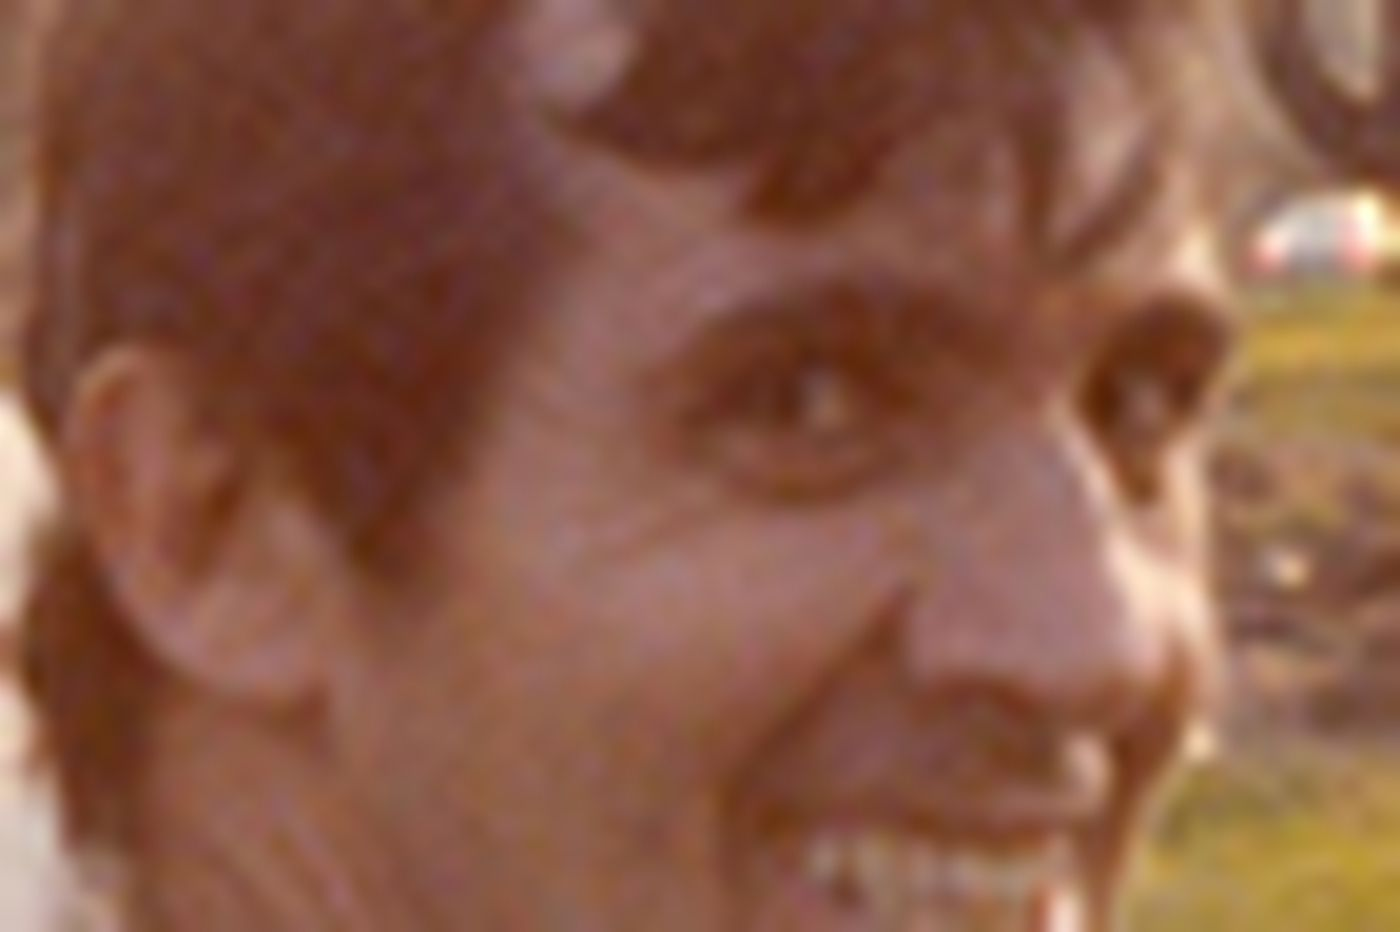 Guido 'Dippy' Carosi, 80, avid athlete